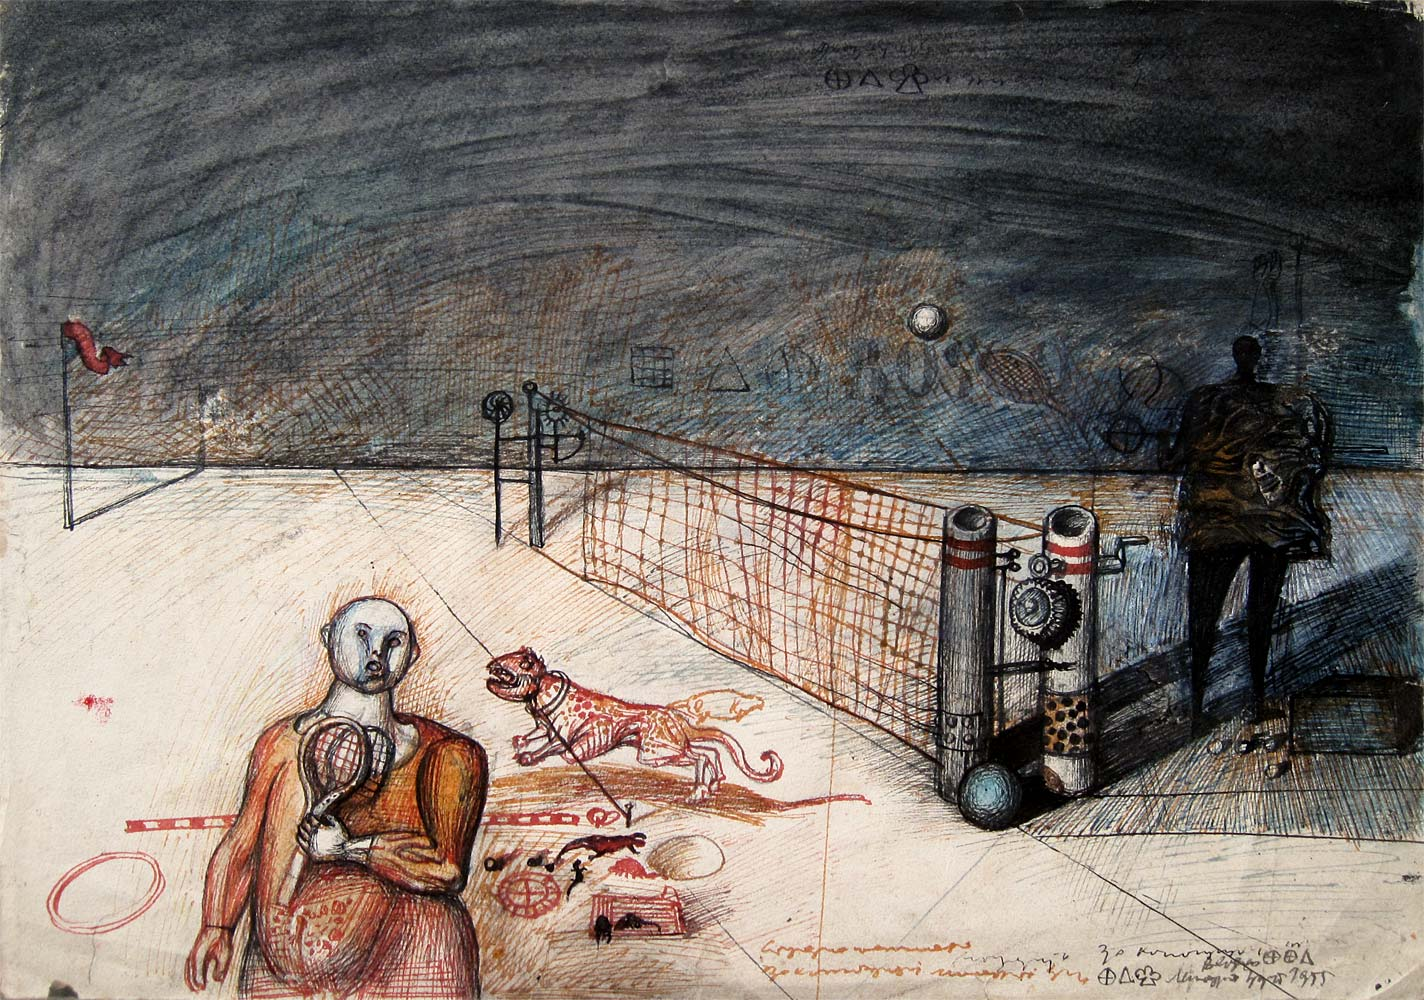 Dadov crtež: Bez naslova, 1955